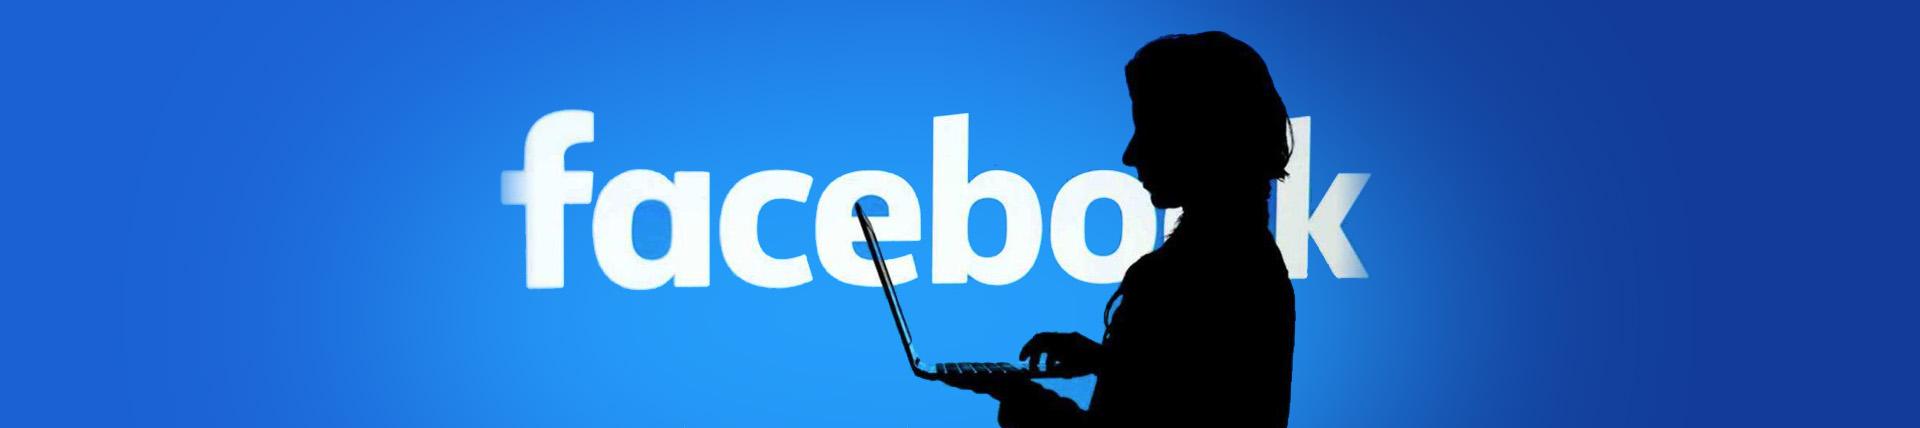 Facebook加码电商业务,注册大量相关域名!